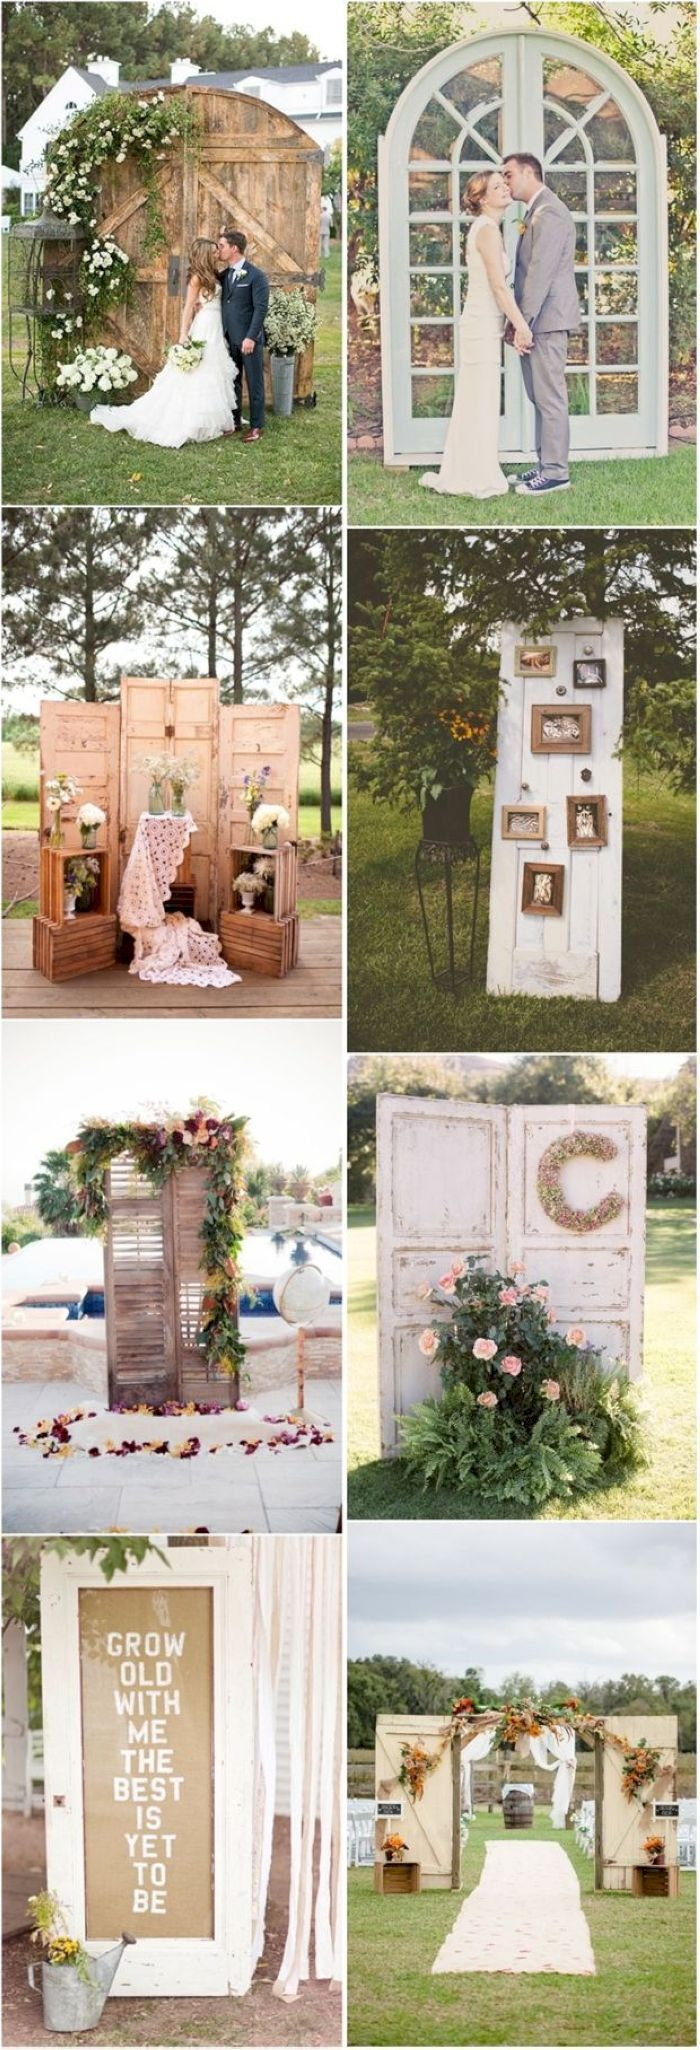 Outdoor wedding decoration ideas cheap   Elegant Outdoor Wedding Decor Ideas on A Budget  Budgeting